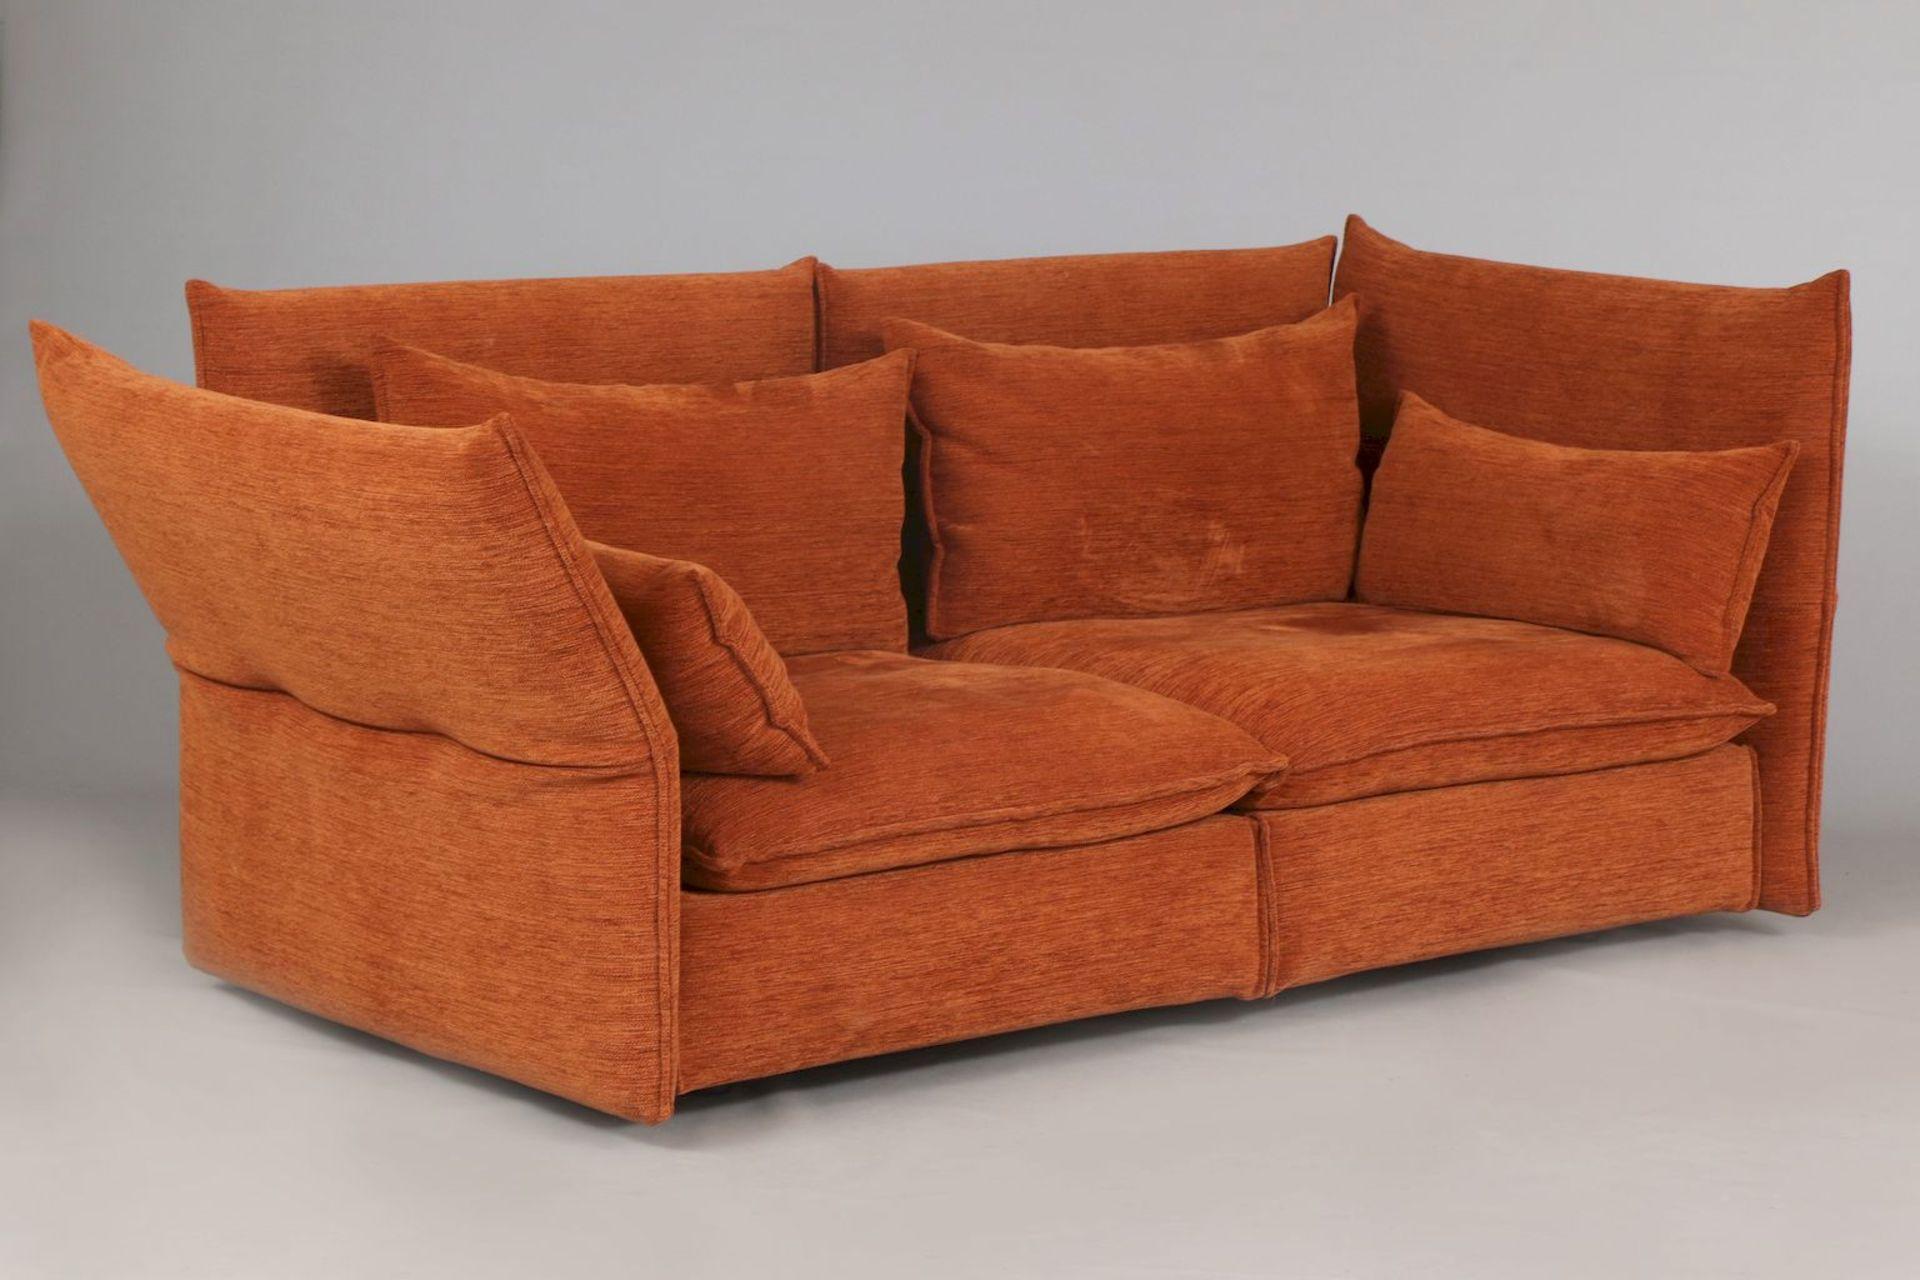 EDWARD BARBER & JAY OSGERBY Sofa ¨Mariposa¨ (2014) - Image 4 of 6